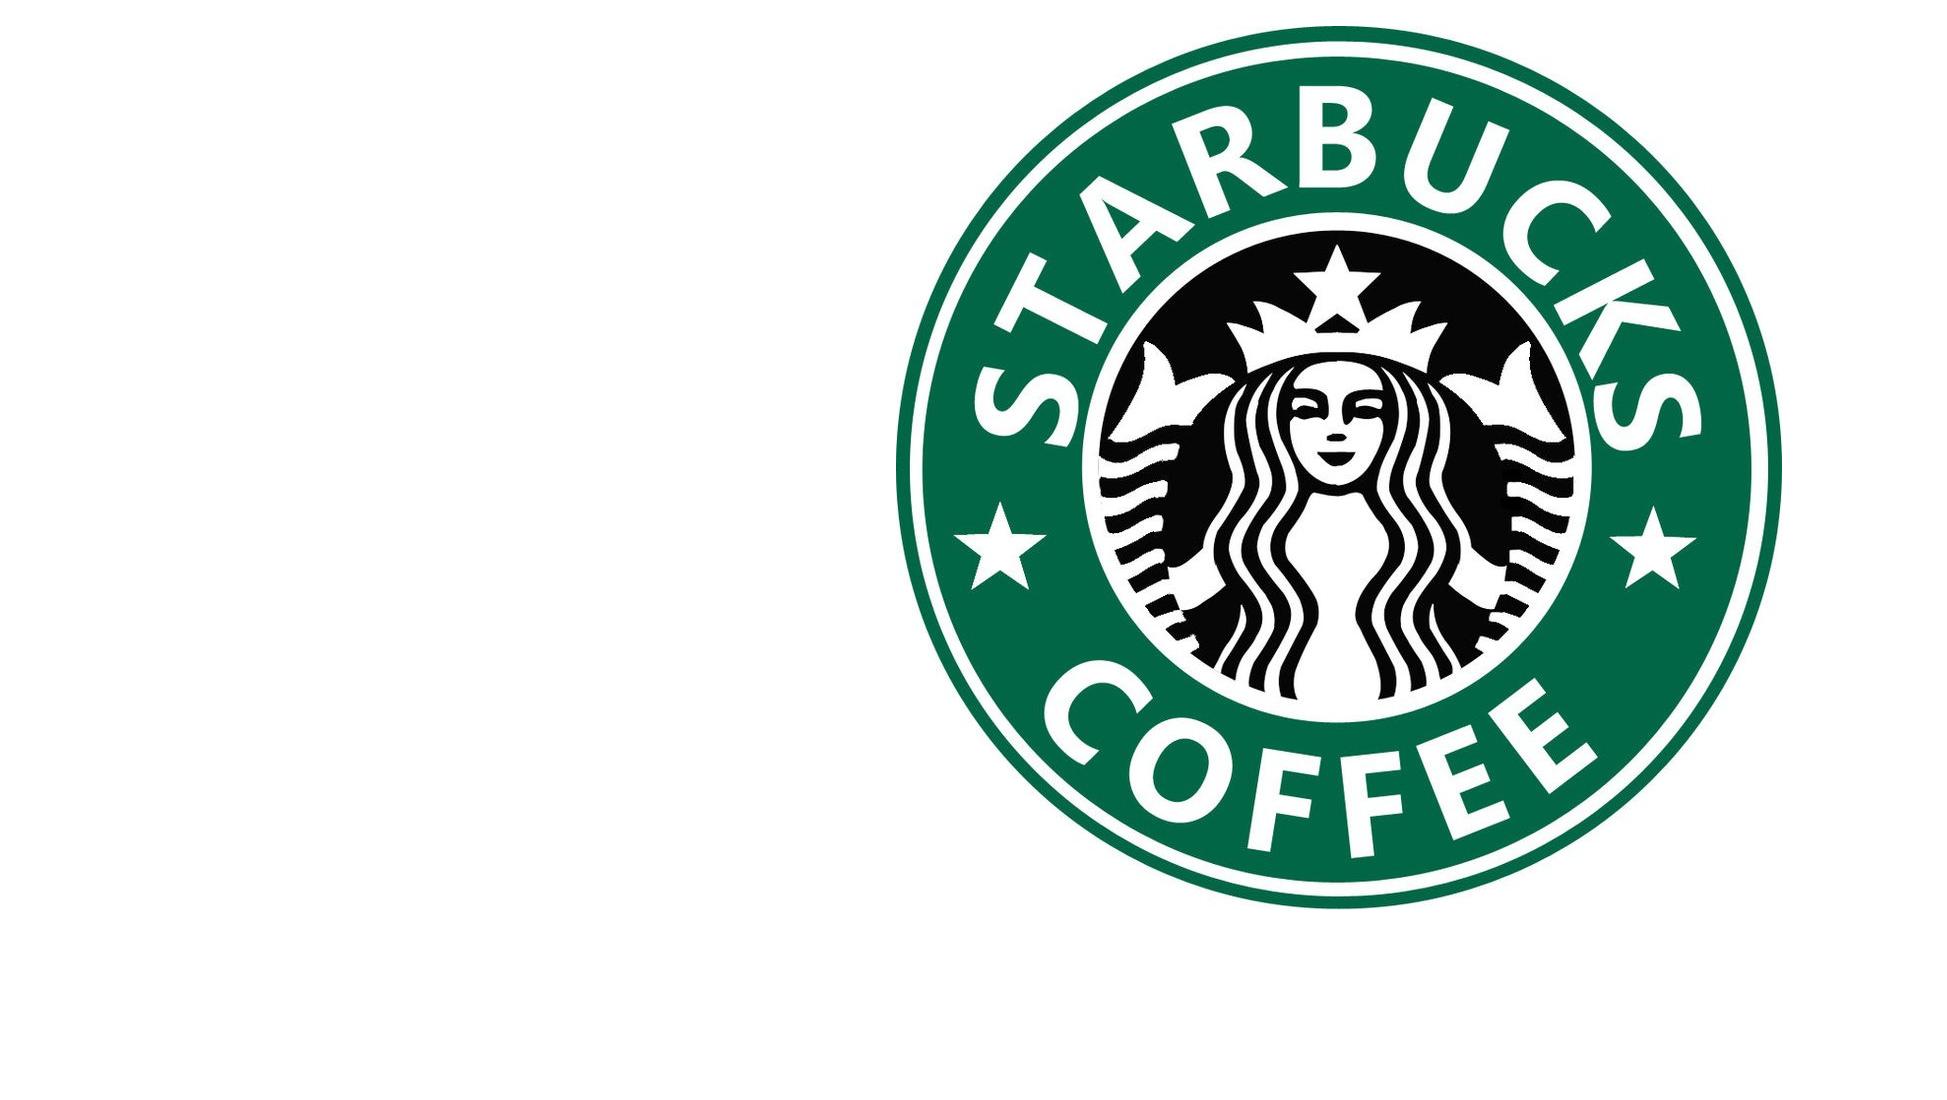 Starbucks Rewards – Make Every Sip More Rewarding